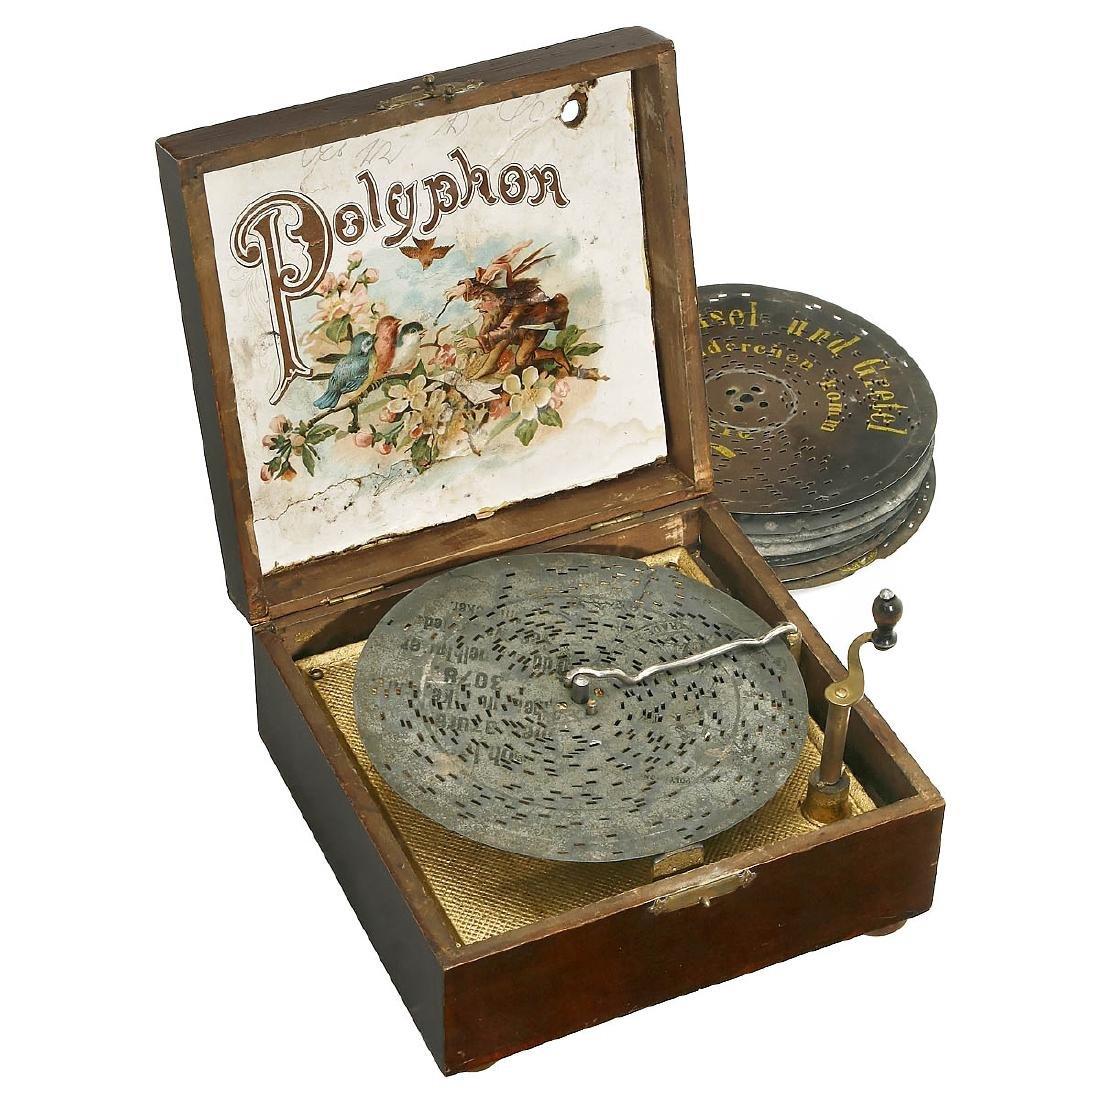 Polyphon Manivelle Disc Musical Box, c. 1900 - 2